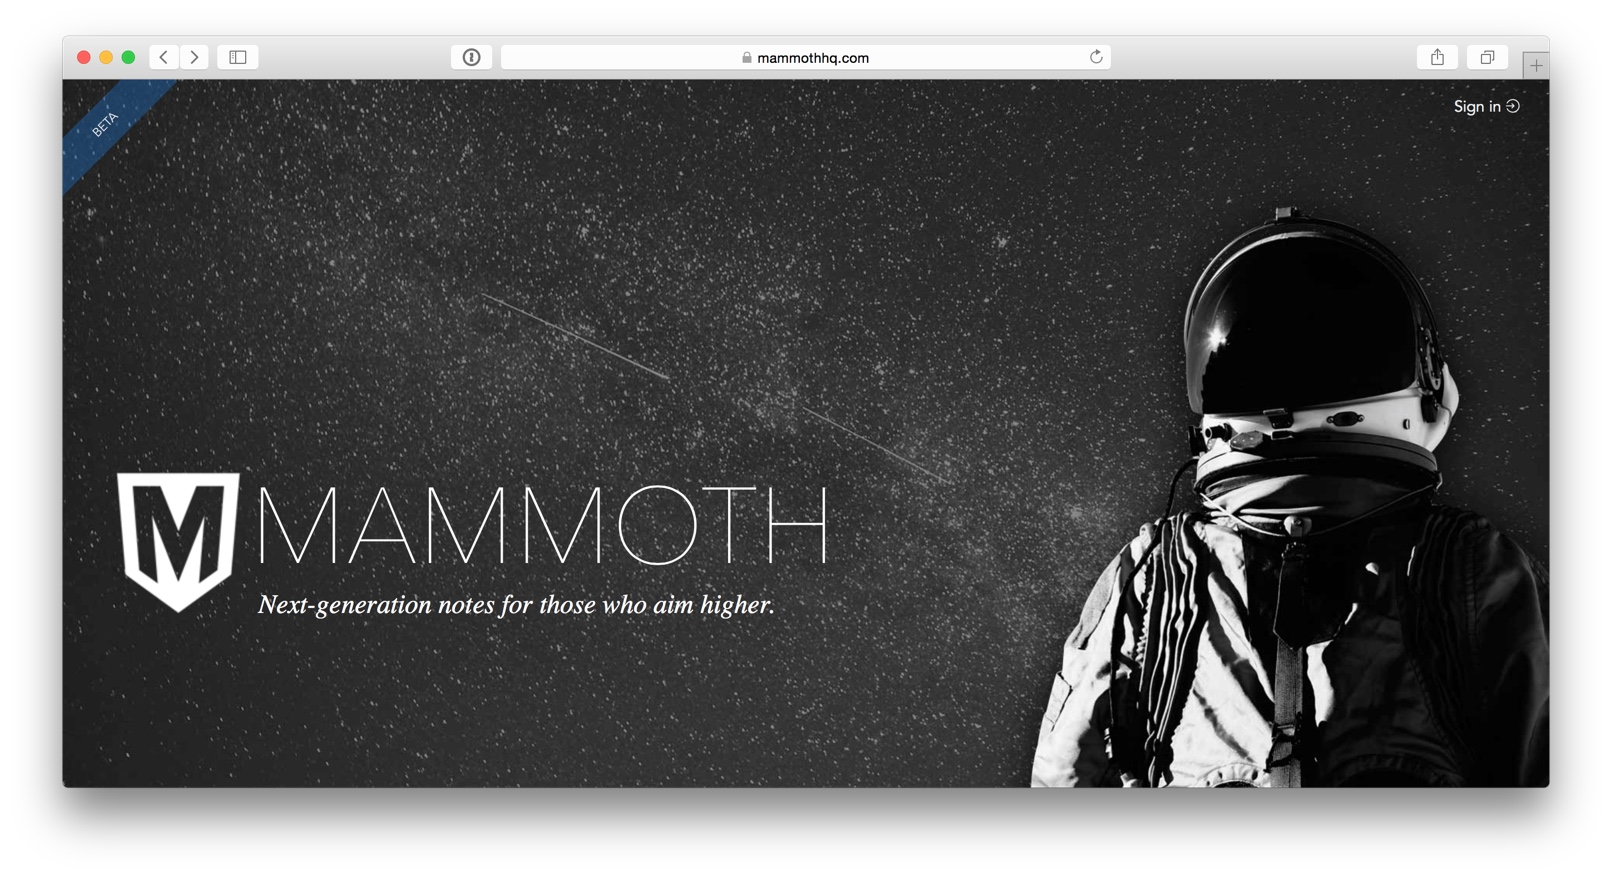 Mammoth homepage